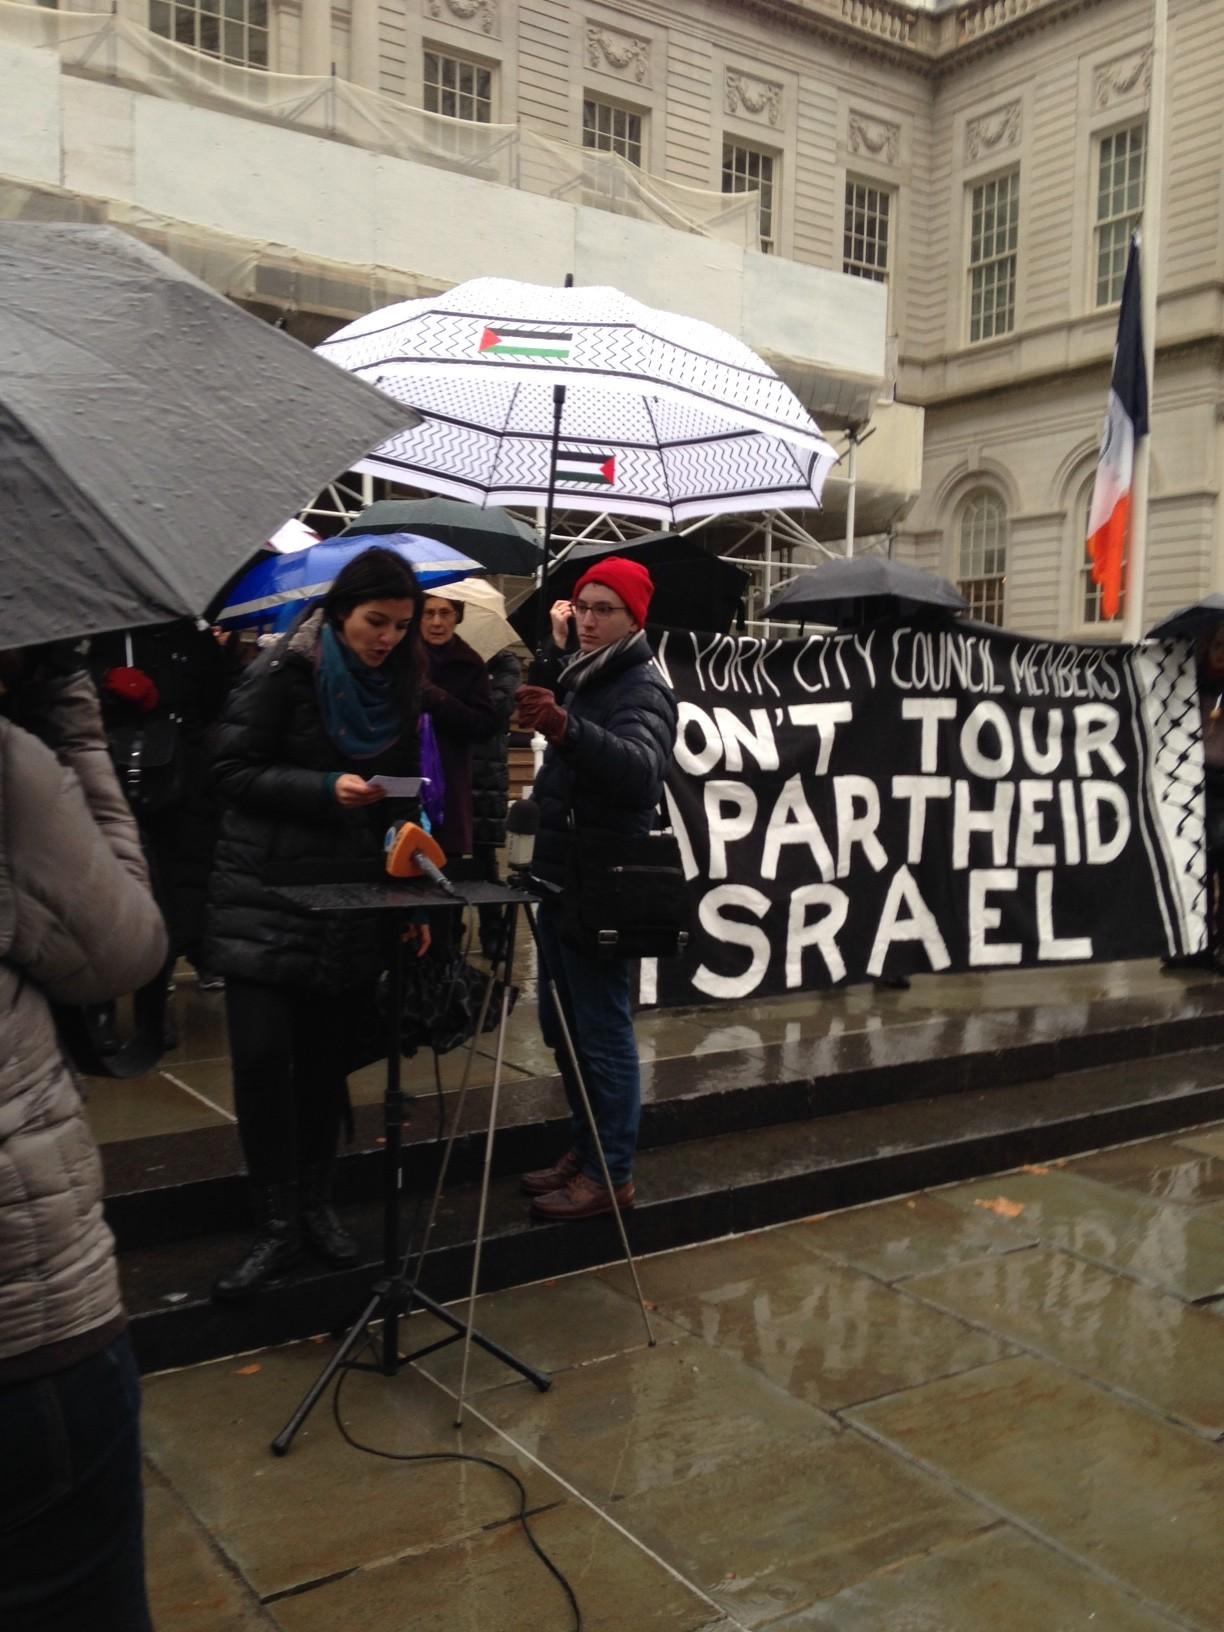 Fatin Jarara of Al-Awda New York, the Palestine Right to Return Coalition, speaks at the rally. (Photo: Eamon Murphy)